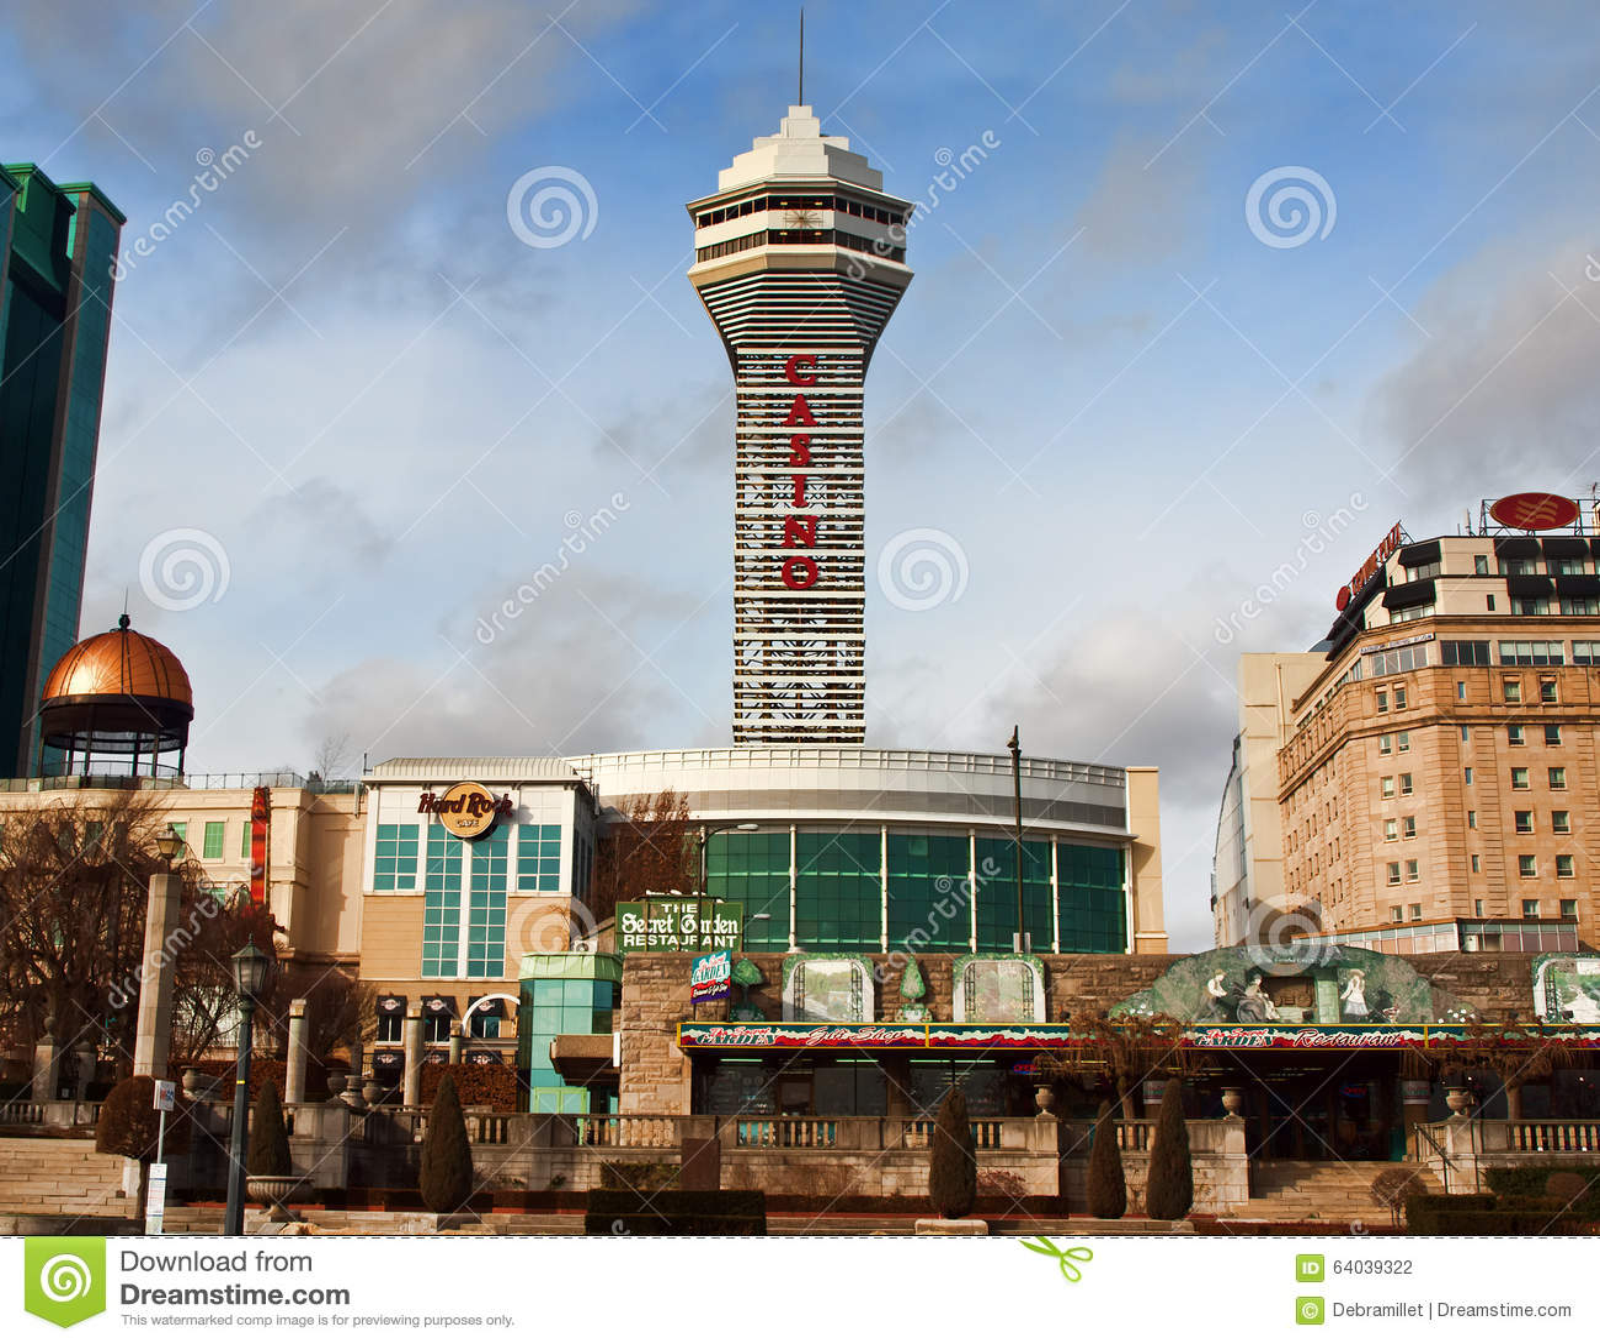 Niagara fallsview casino resort 13